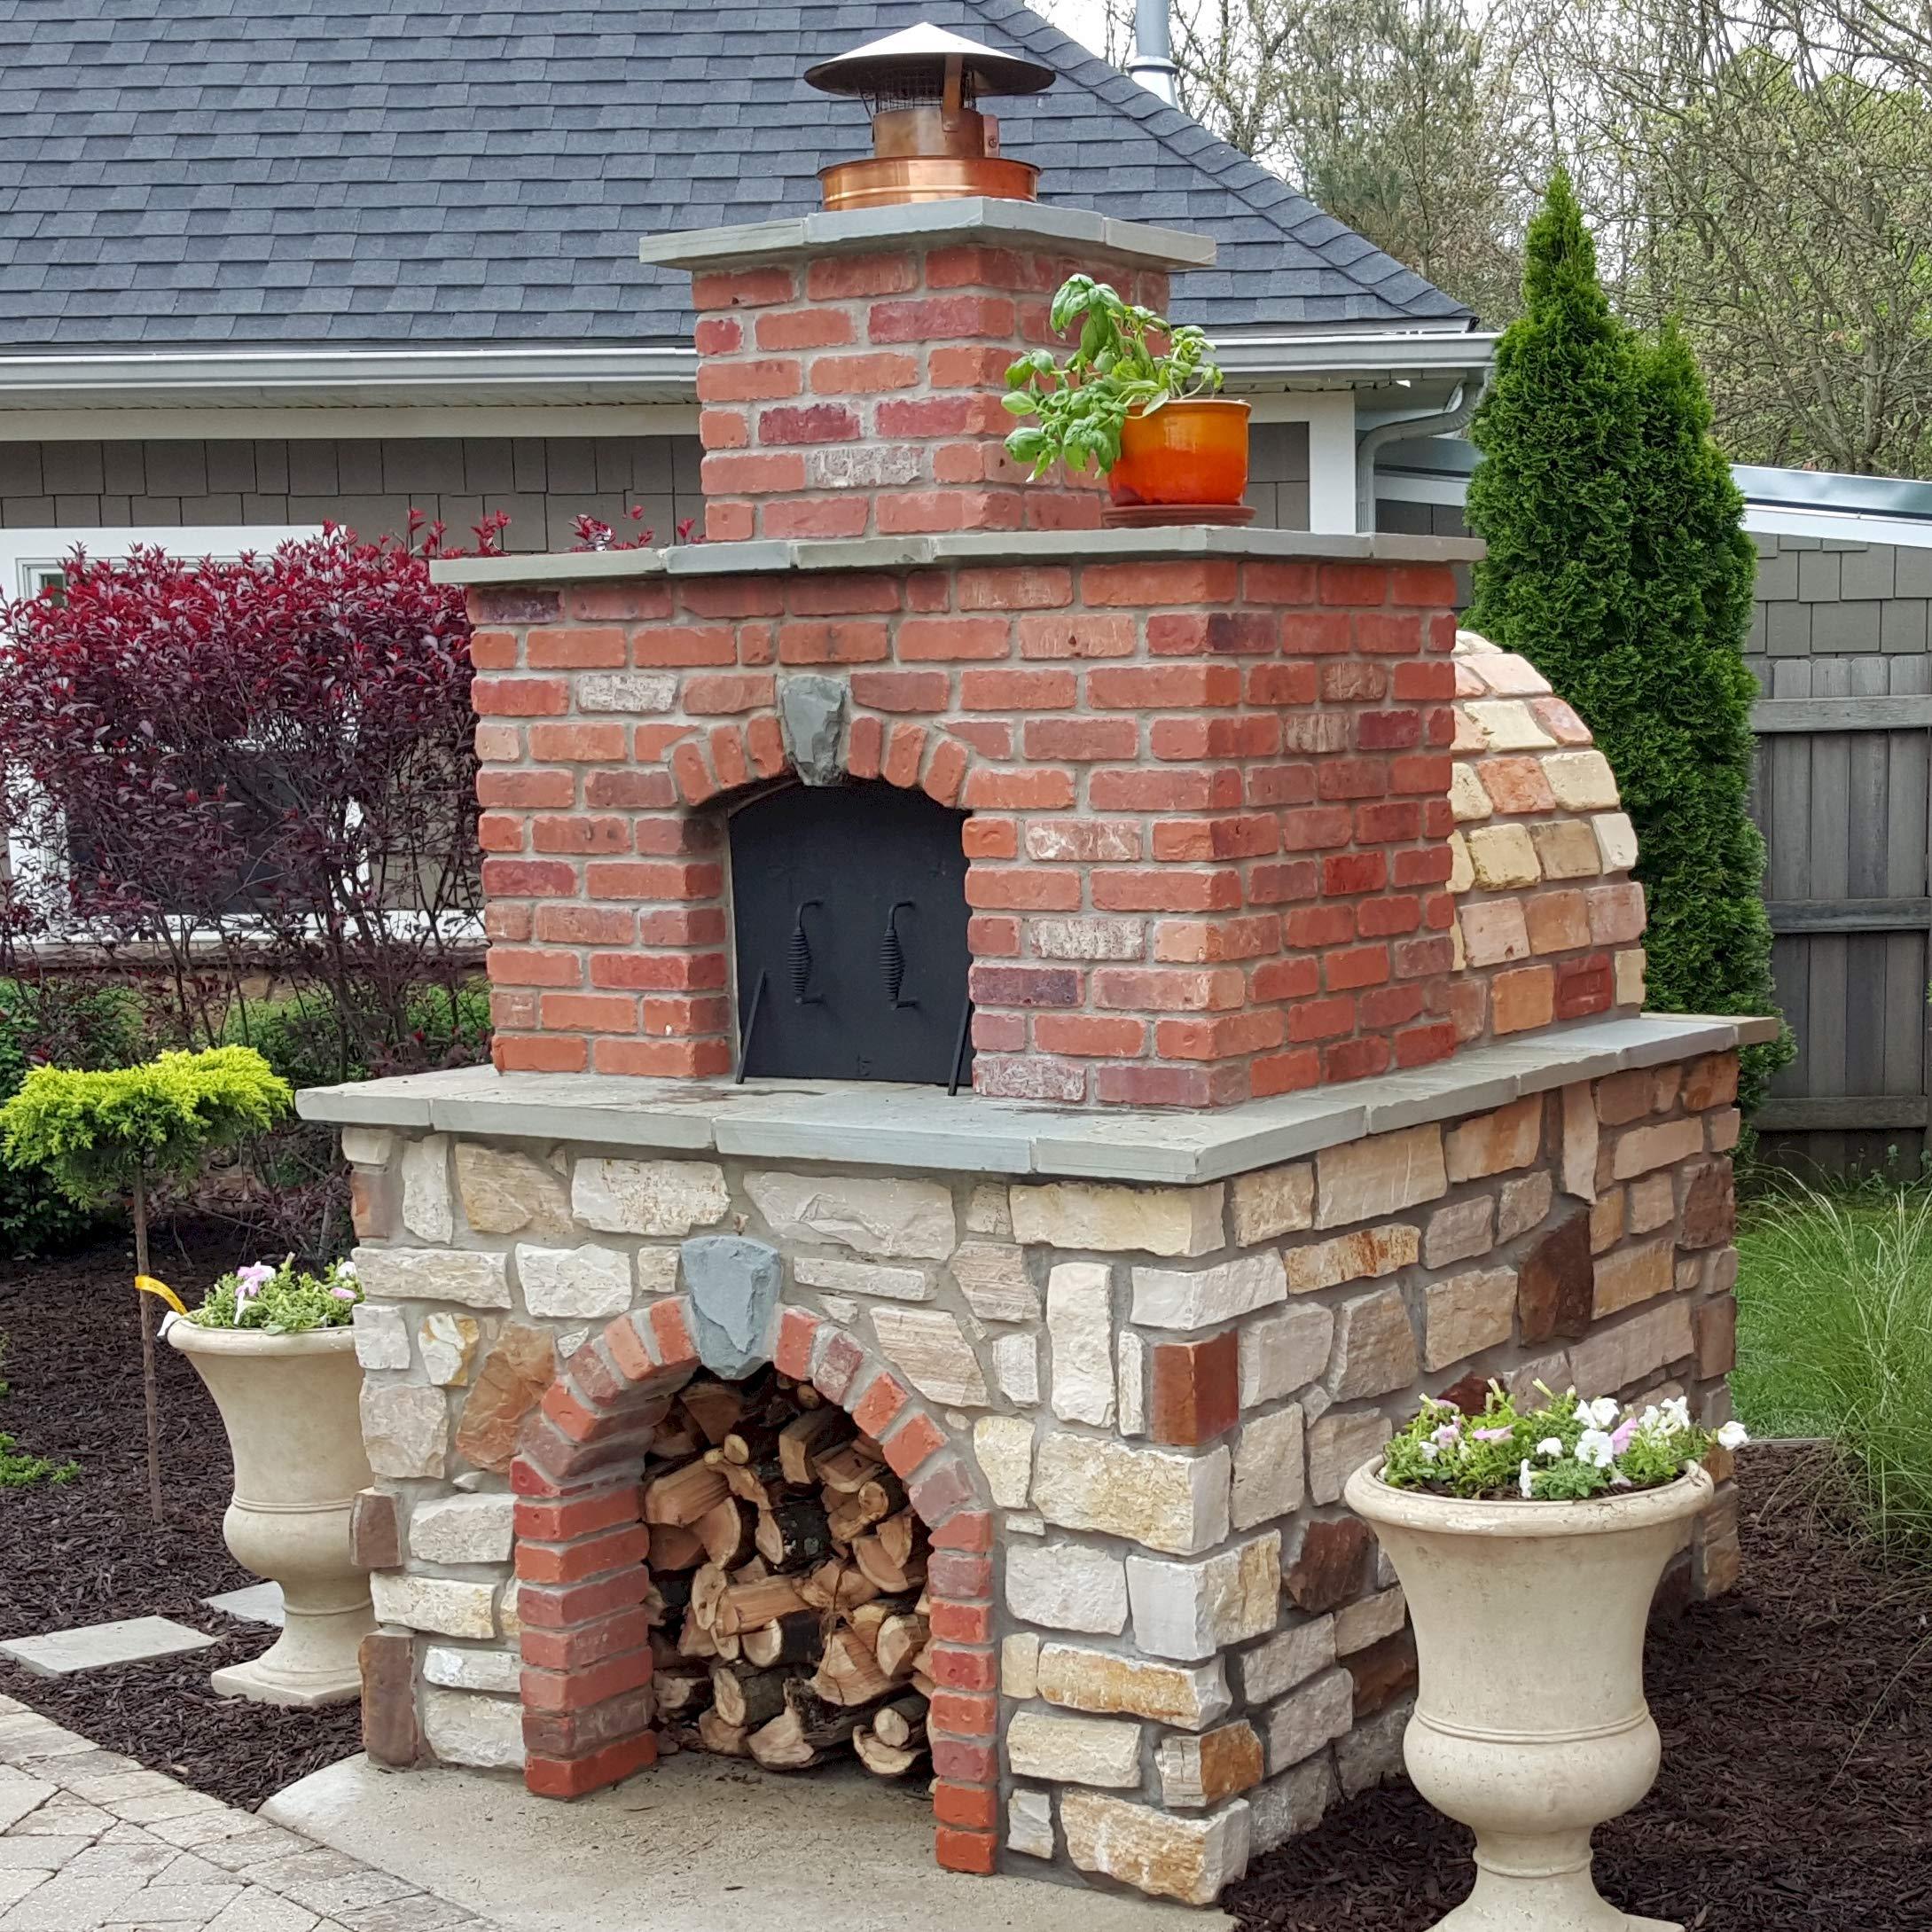 Building Pizza Oven Plans - Find house plans